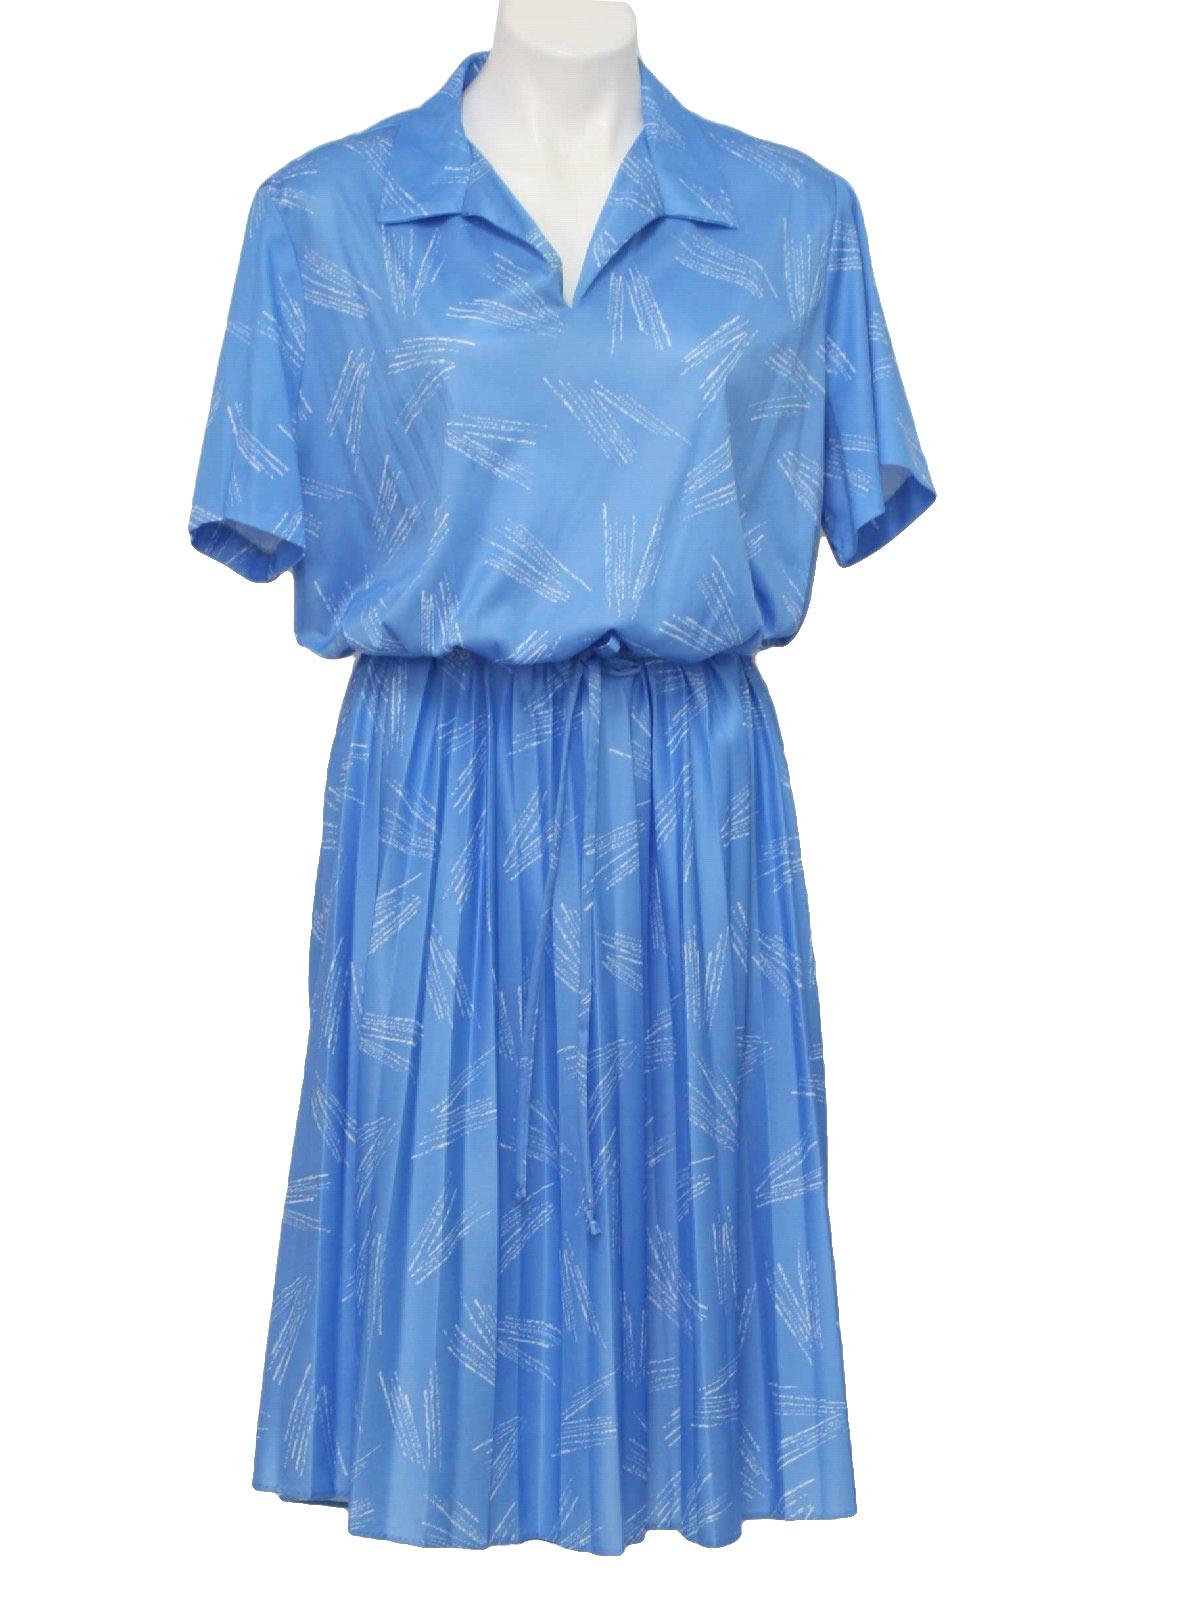 70s -Haband- Womens blue, silky polyester, short sleeve dress, having